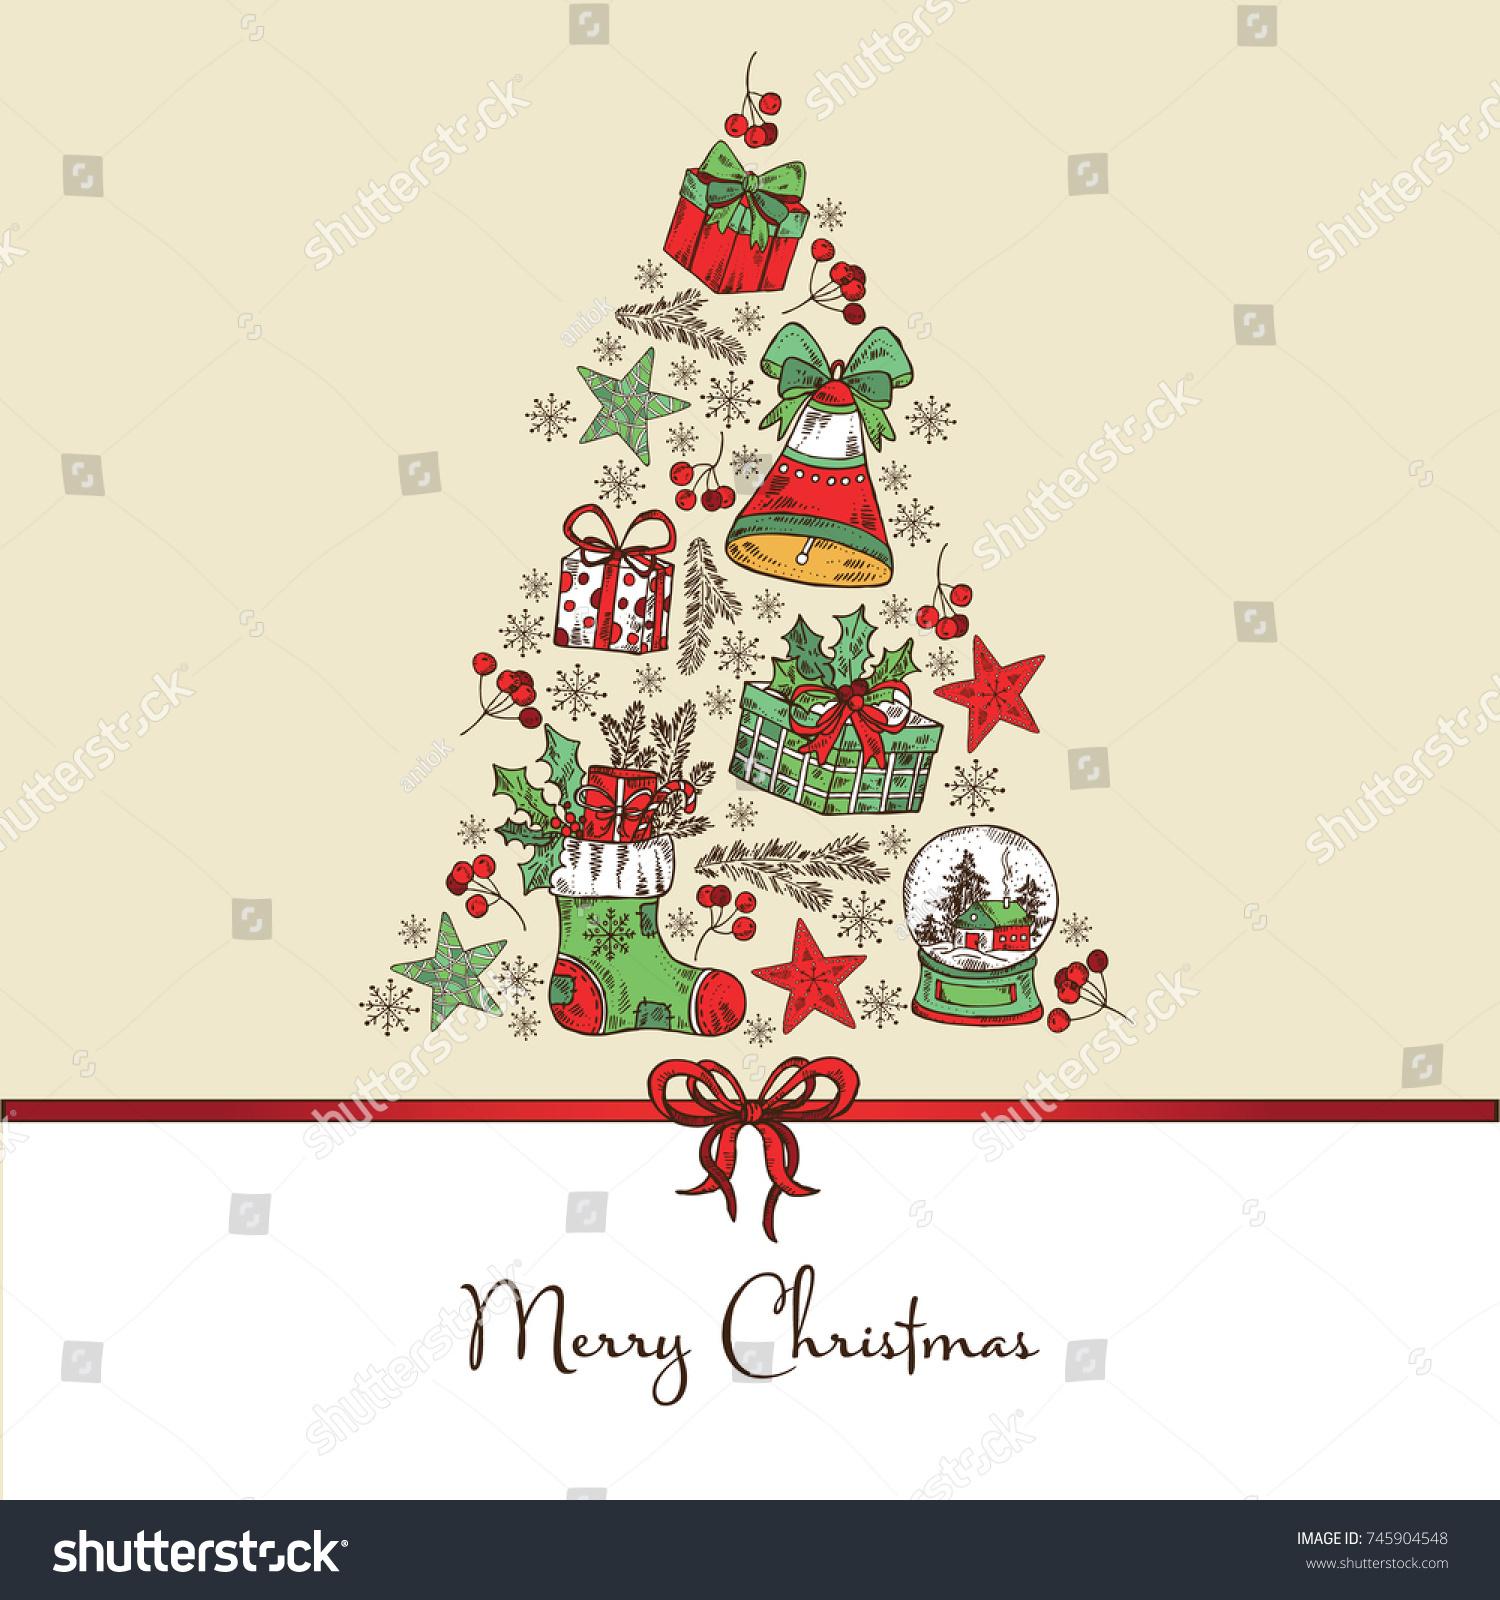 Christmas New Year Card Christmas Tree Stock Vector (Royalty Free ...